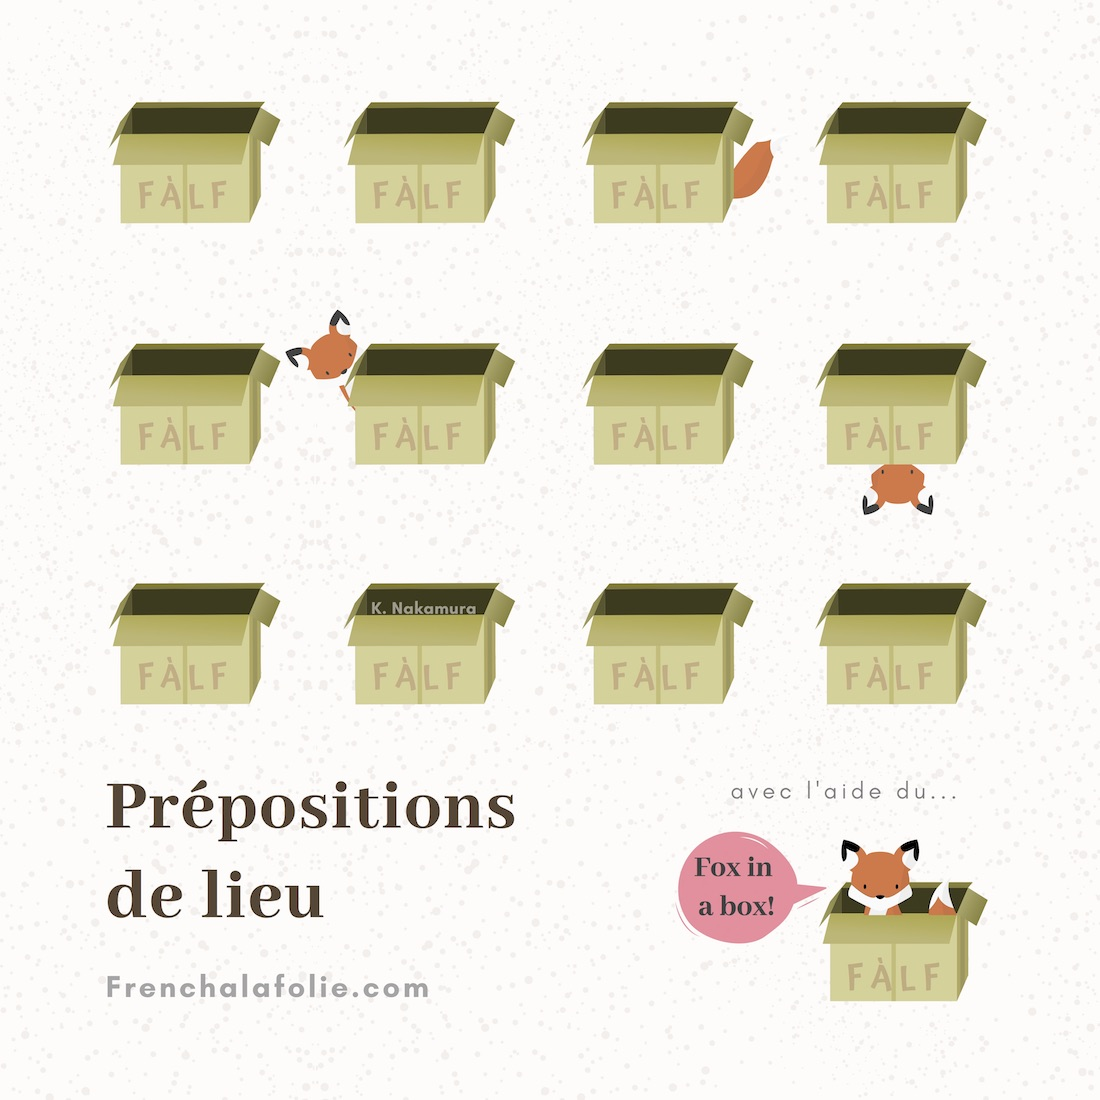 The Falf Guide To Les Prepositions De Lieu